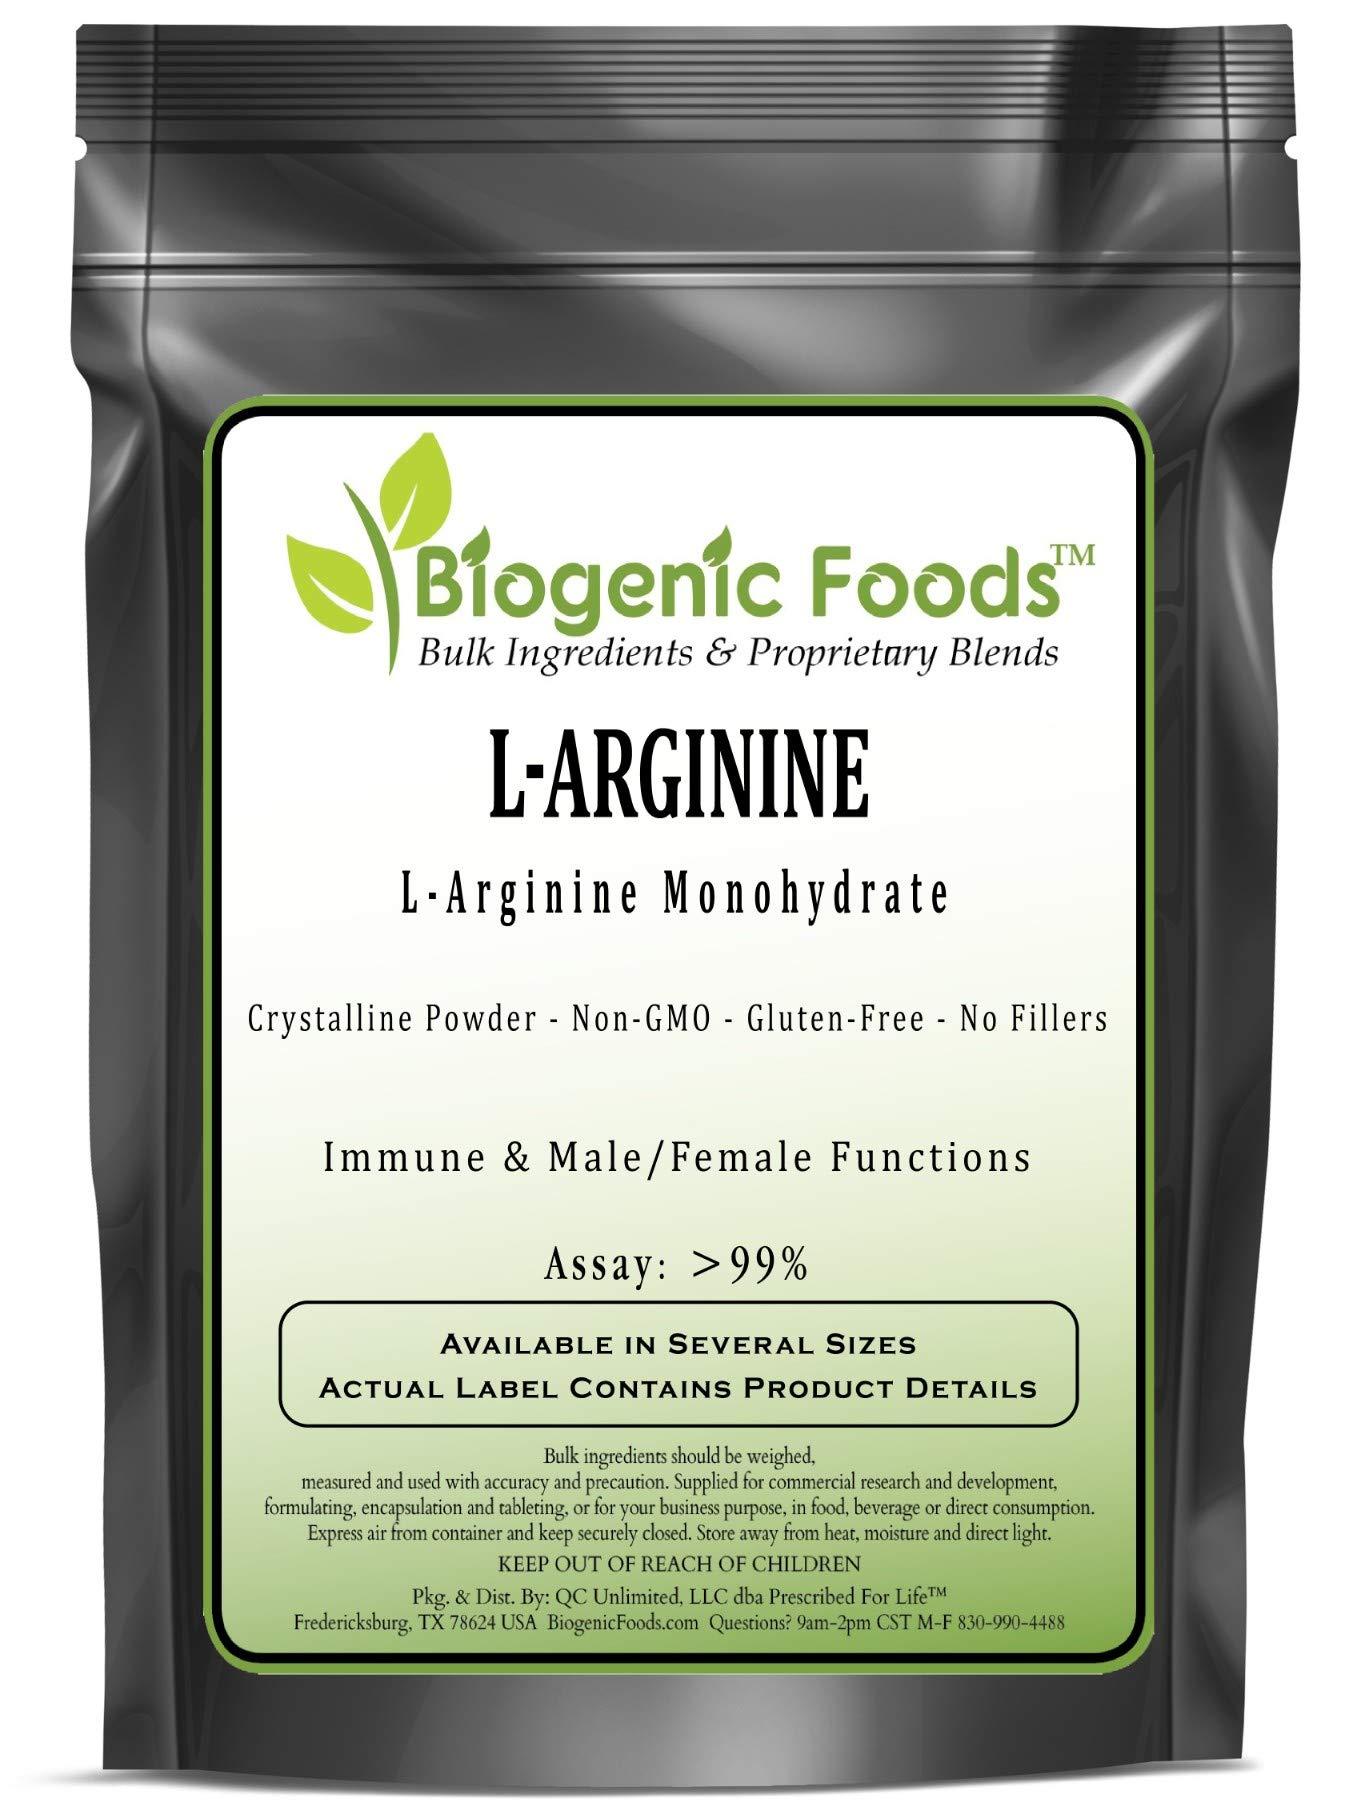 Arginine (L) - L-Arginine Base Amino Acid Powder (Assay: > 99%), 25 kg